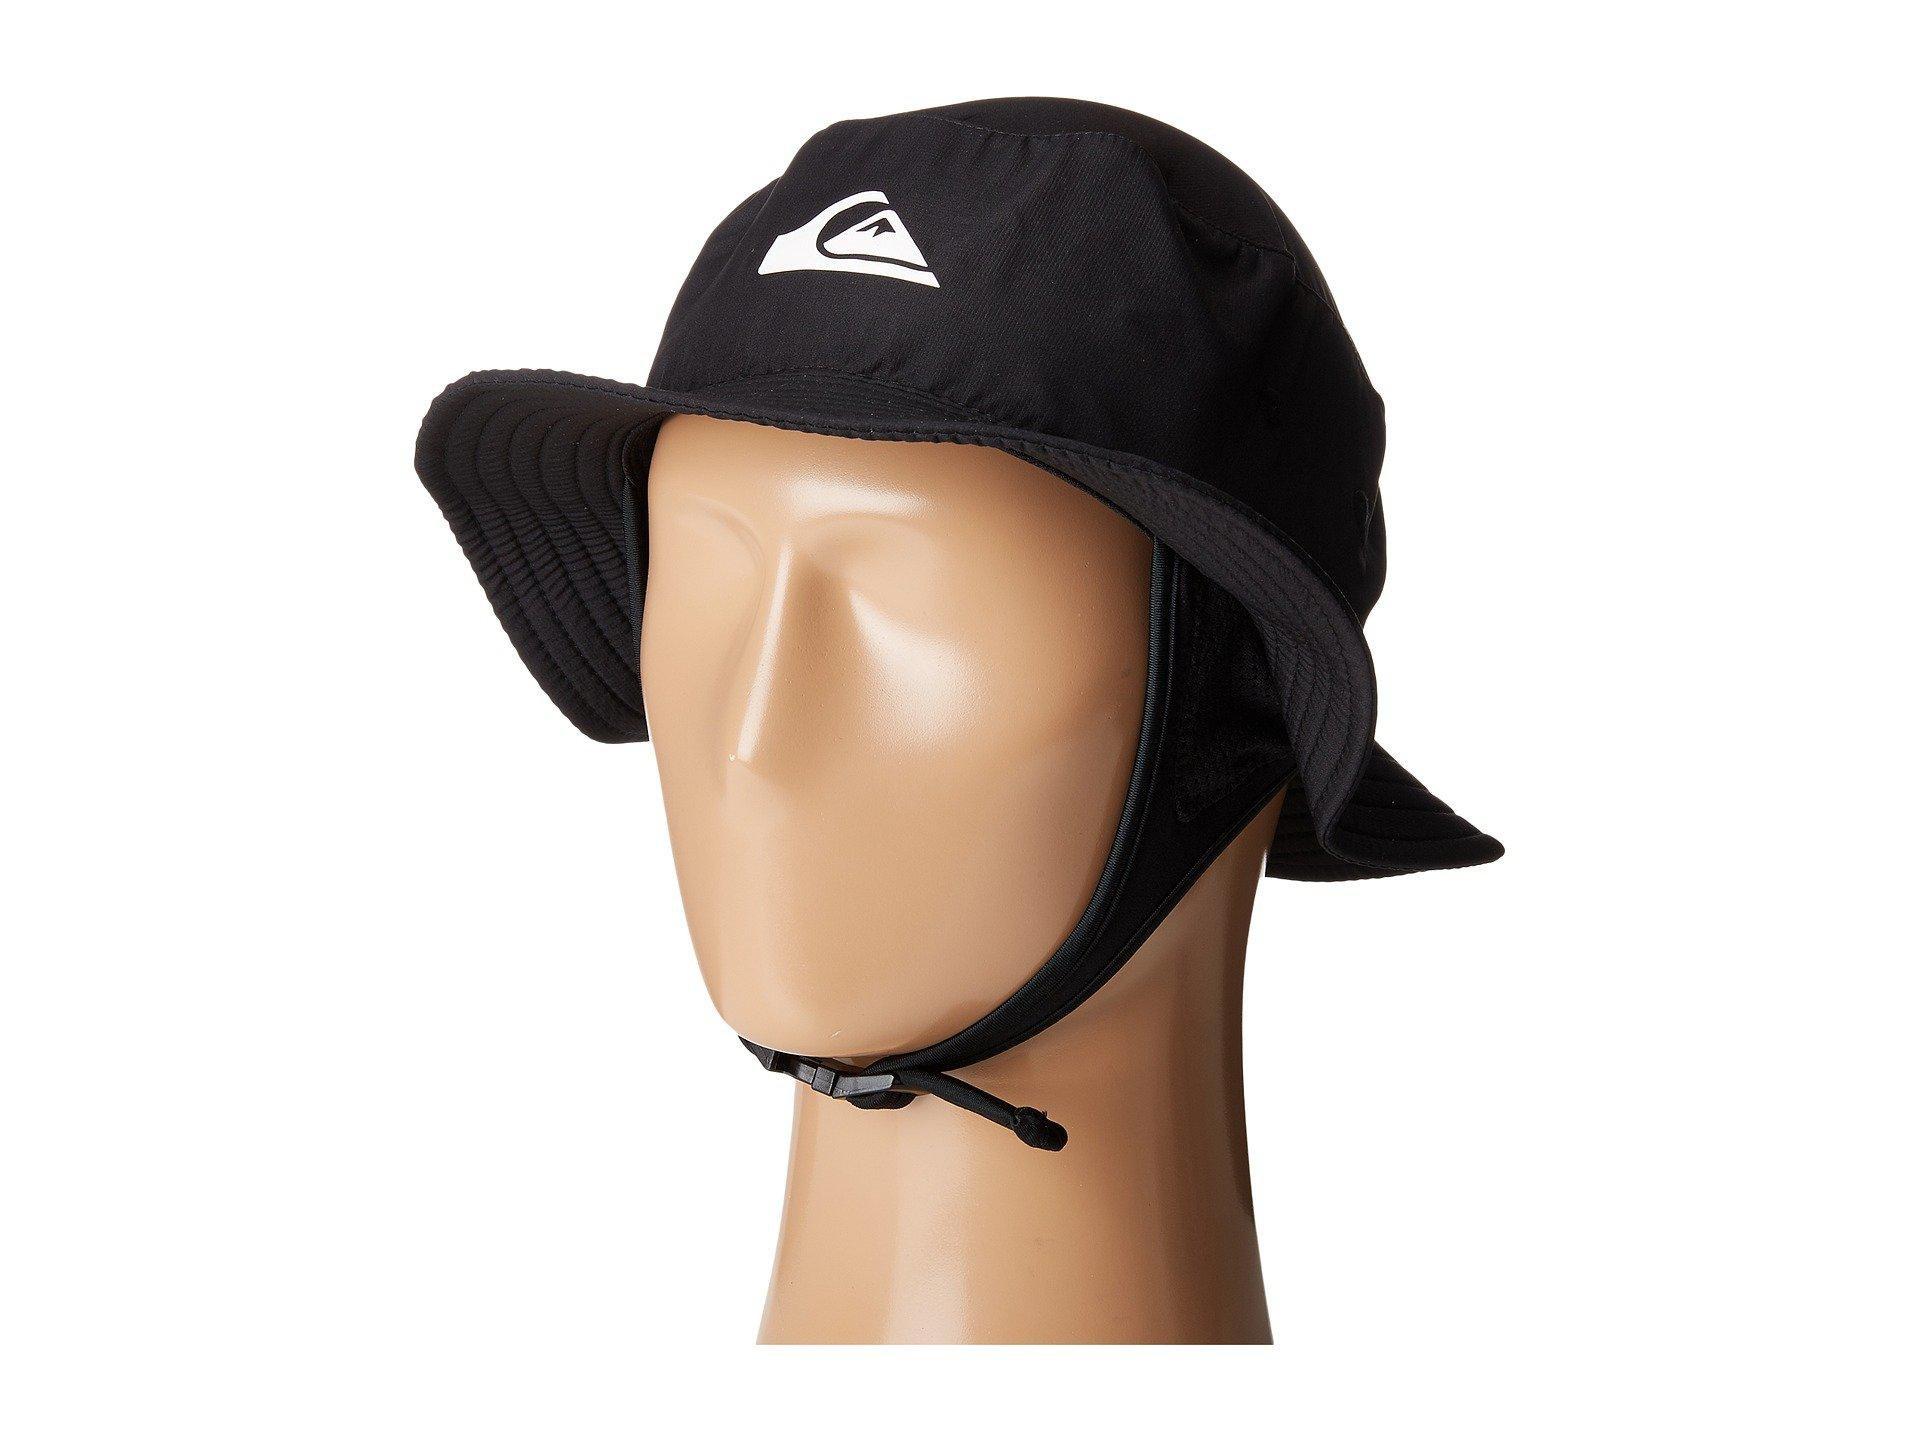 Lyst - Quiksilver Bushmaster Surf Hat (black) Bucket Caps in Black ... ae47178274b1